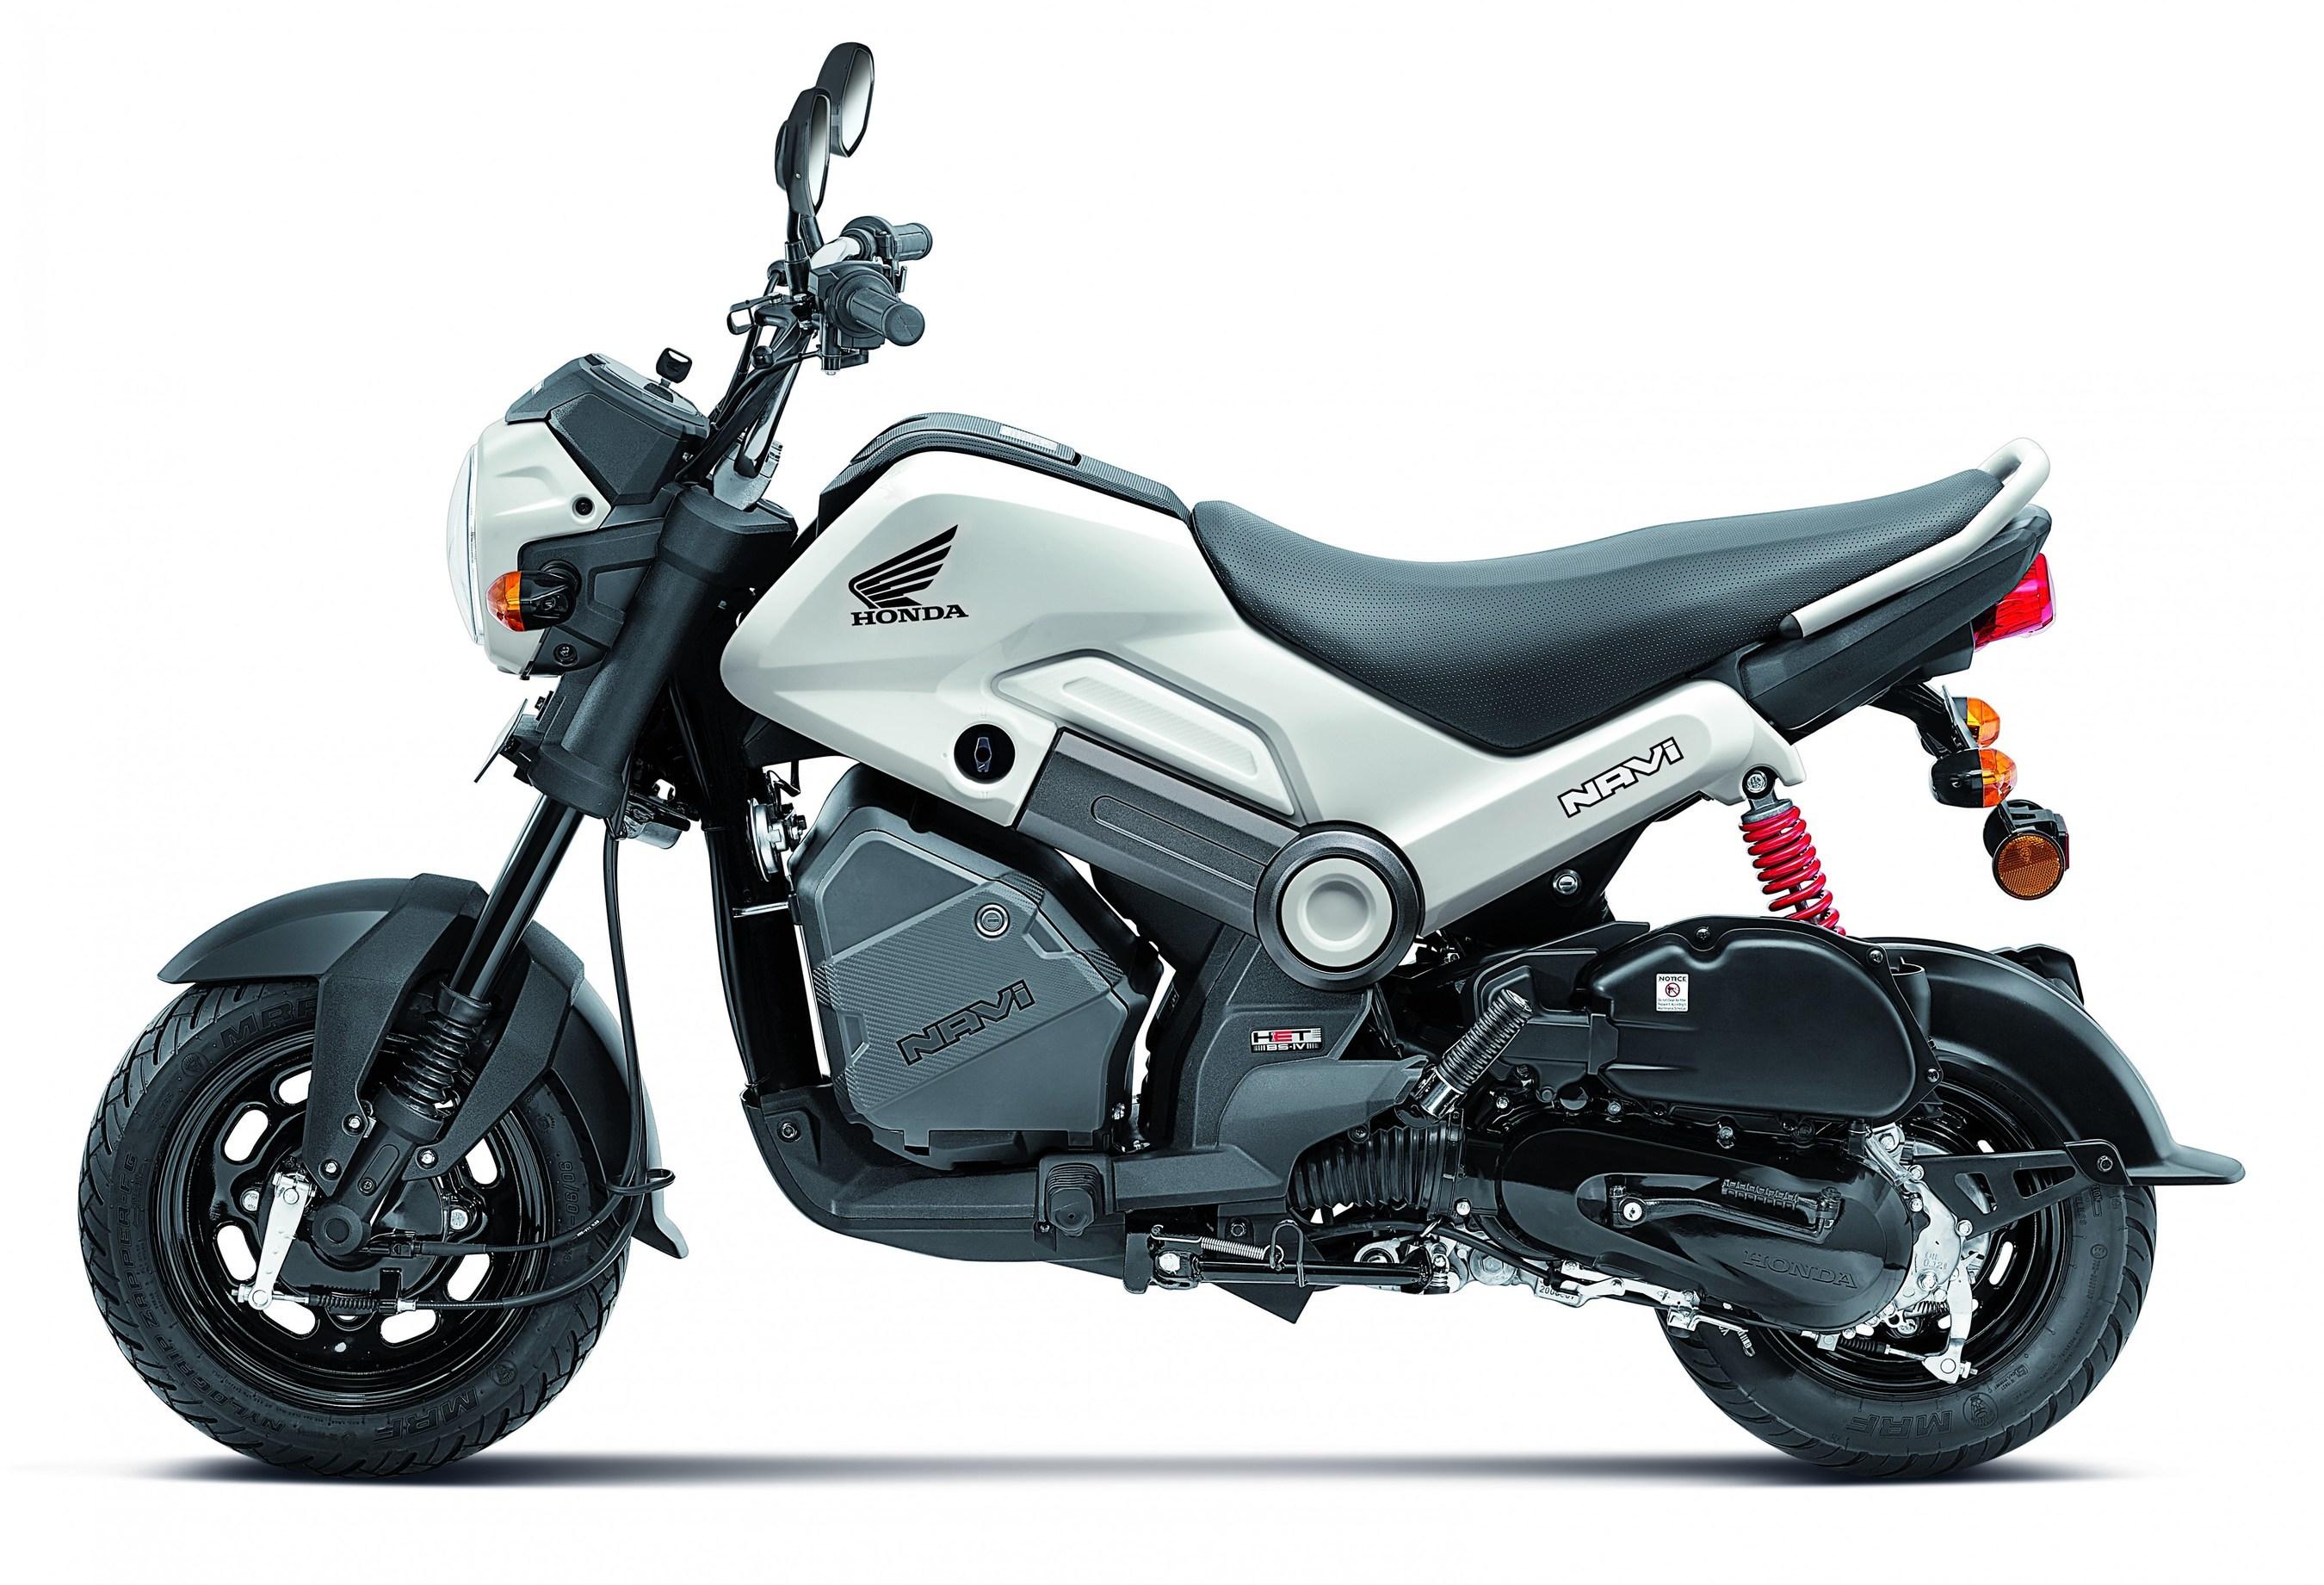 Motos honda 2020